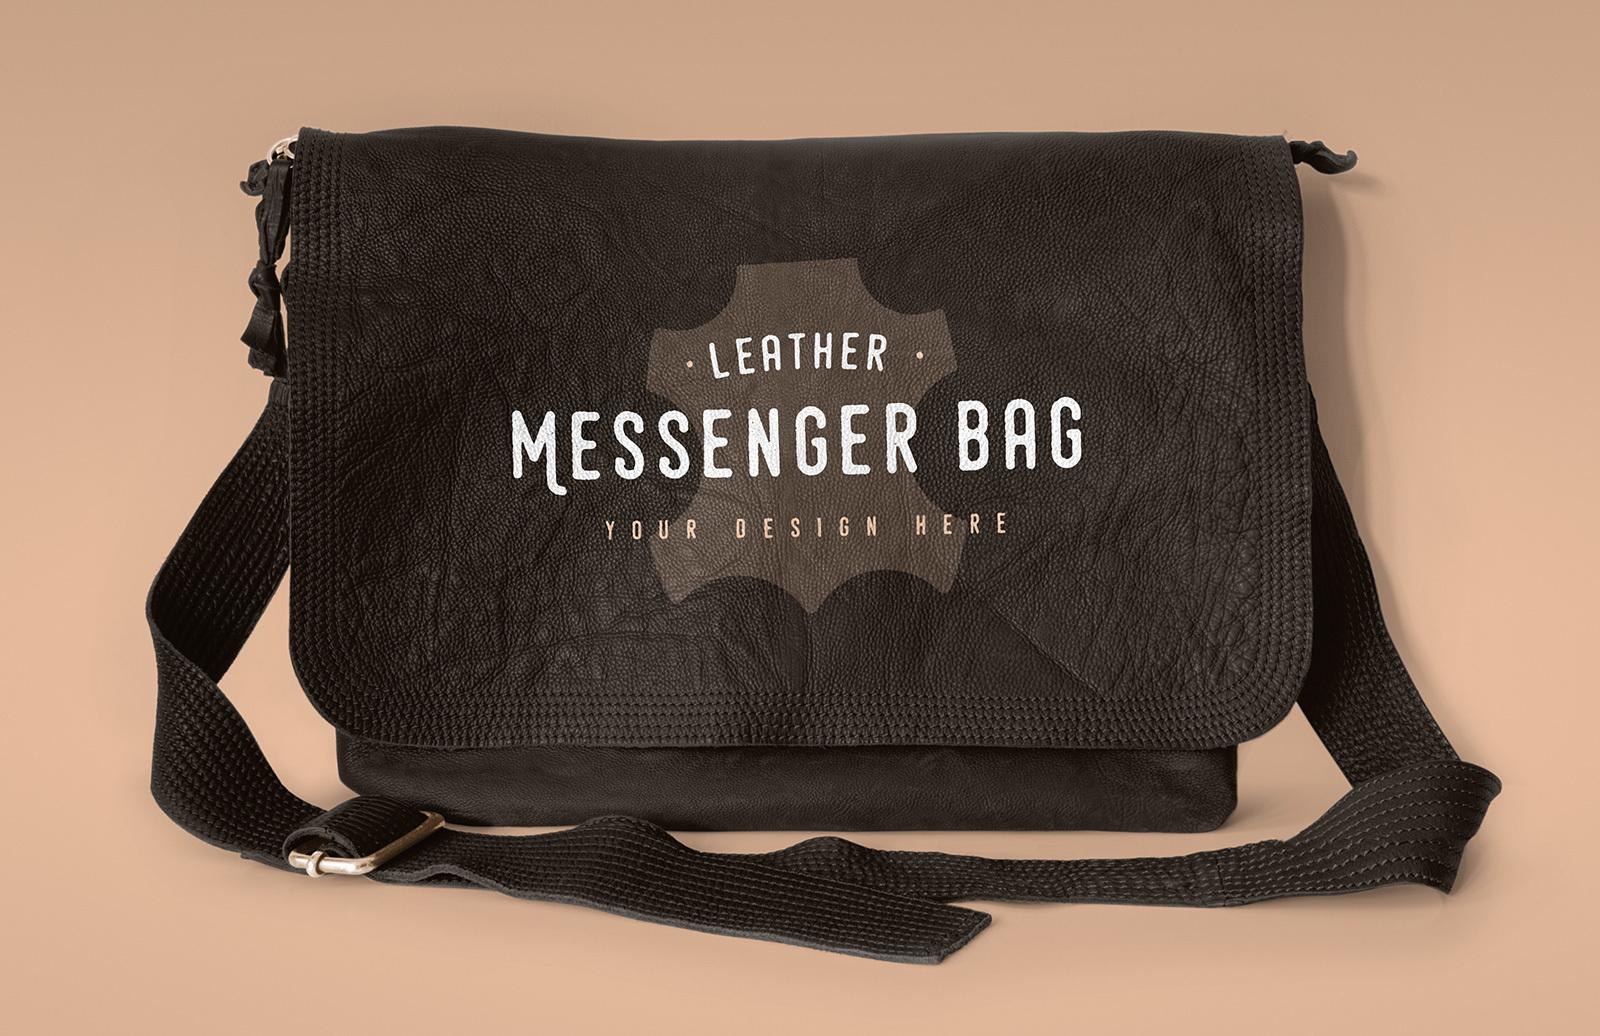 Leather Messenger Bag Mockup Preview 1